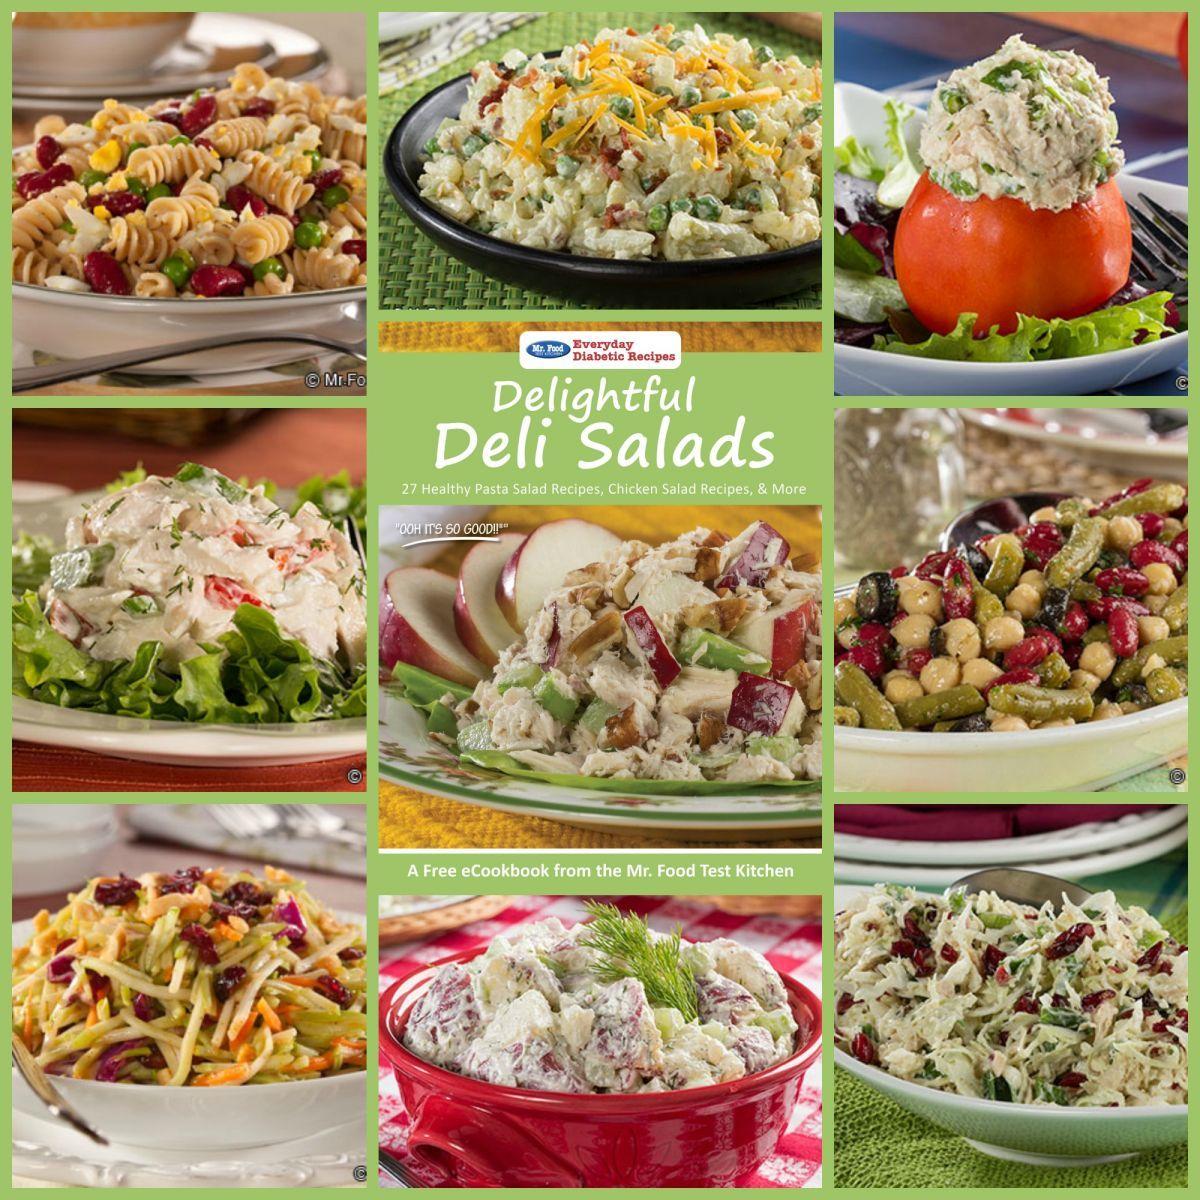 Everydaydiabeticrecipes Com: Delightful Deli Salads Free ECookbook